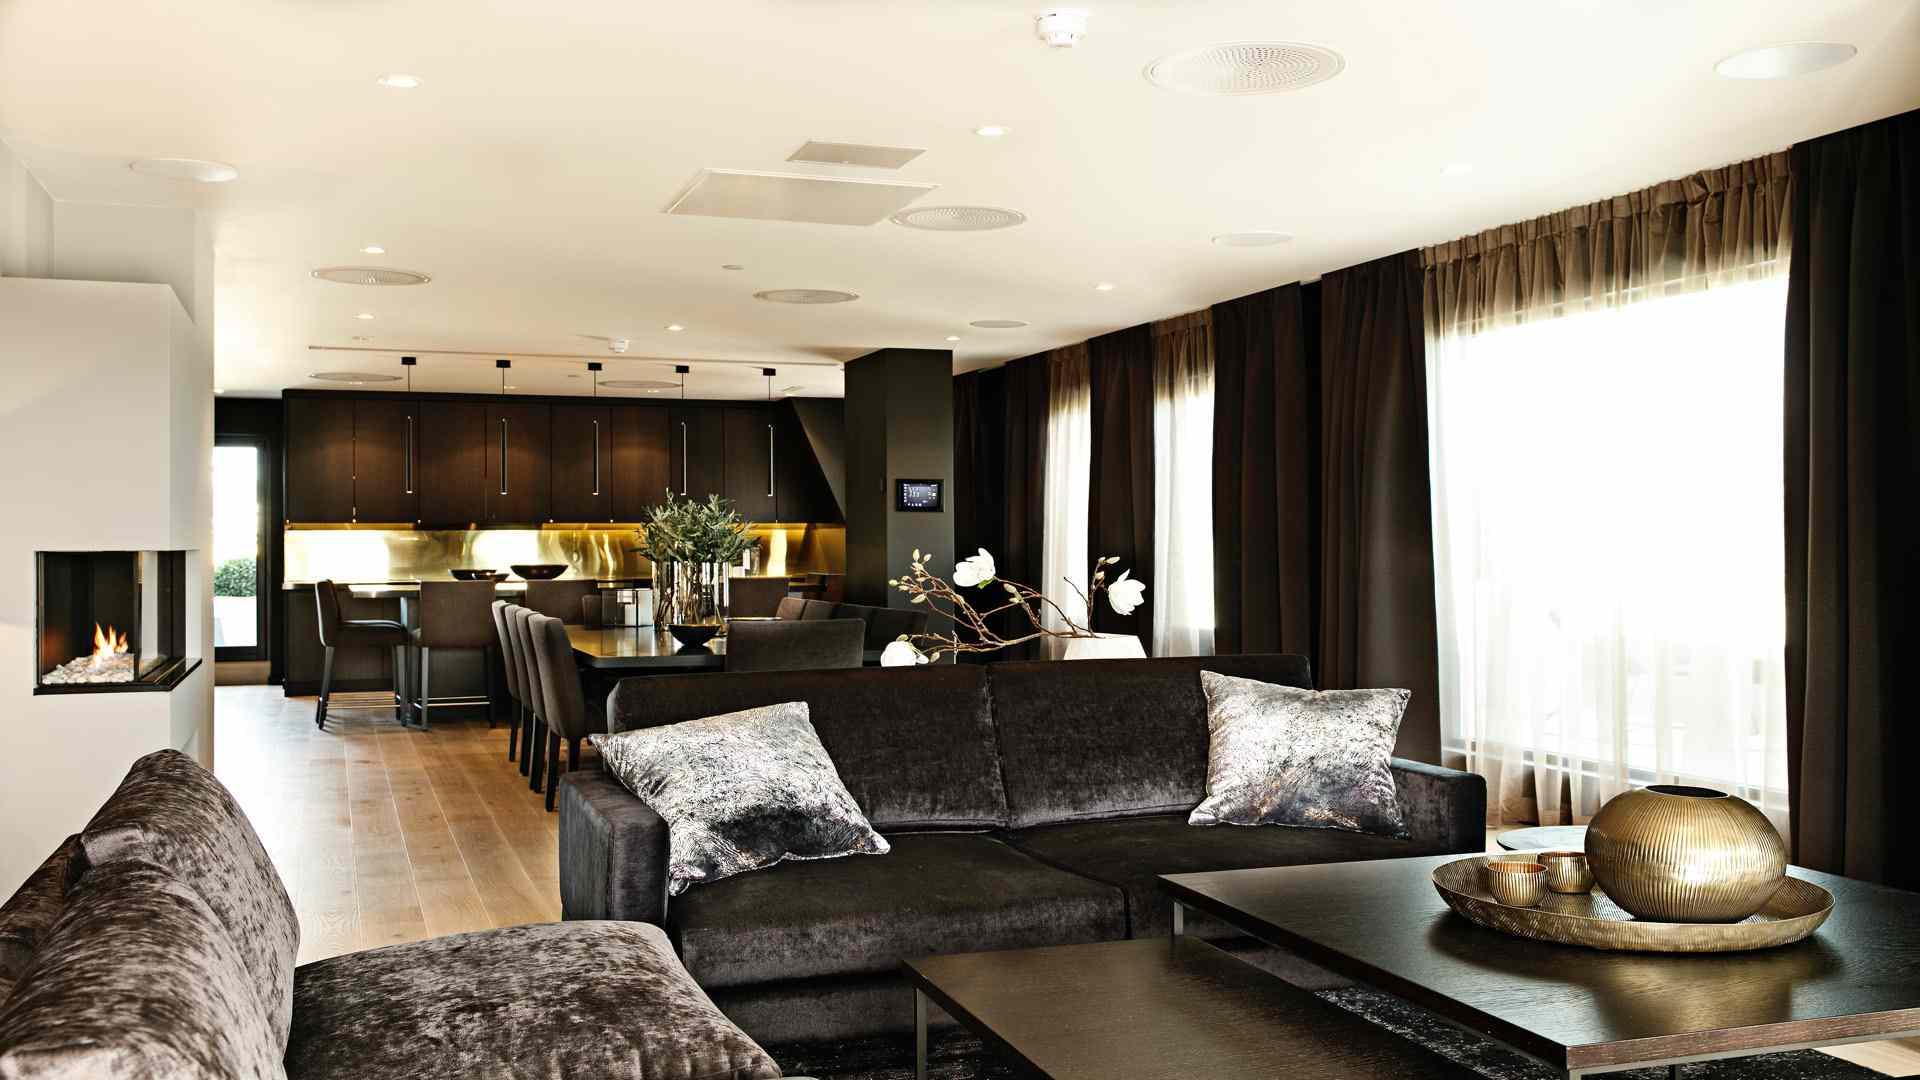 Interior of Saga Hotel Oslo